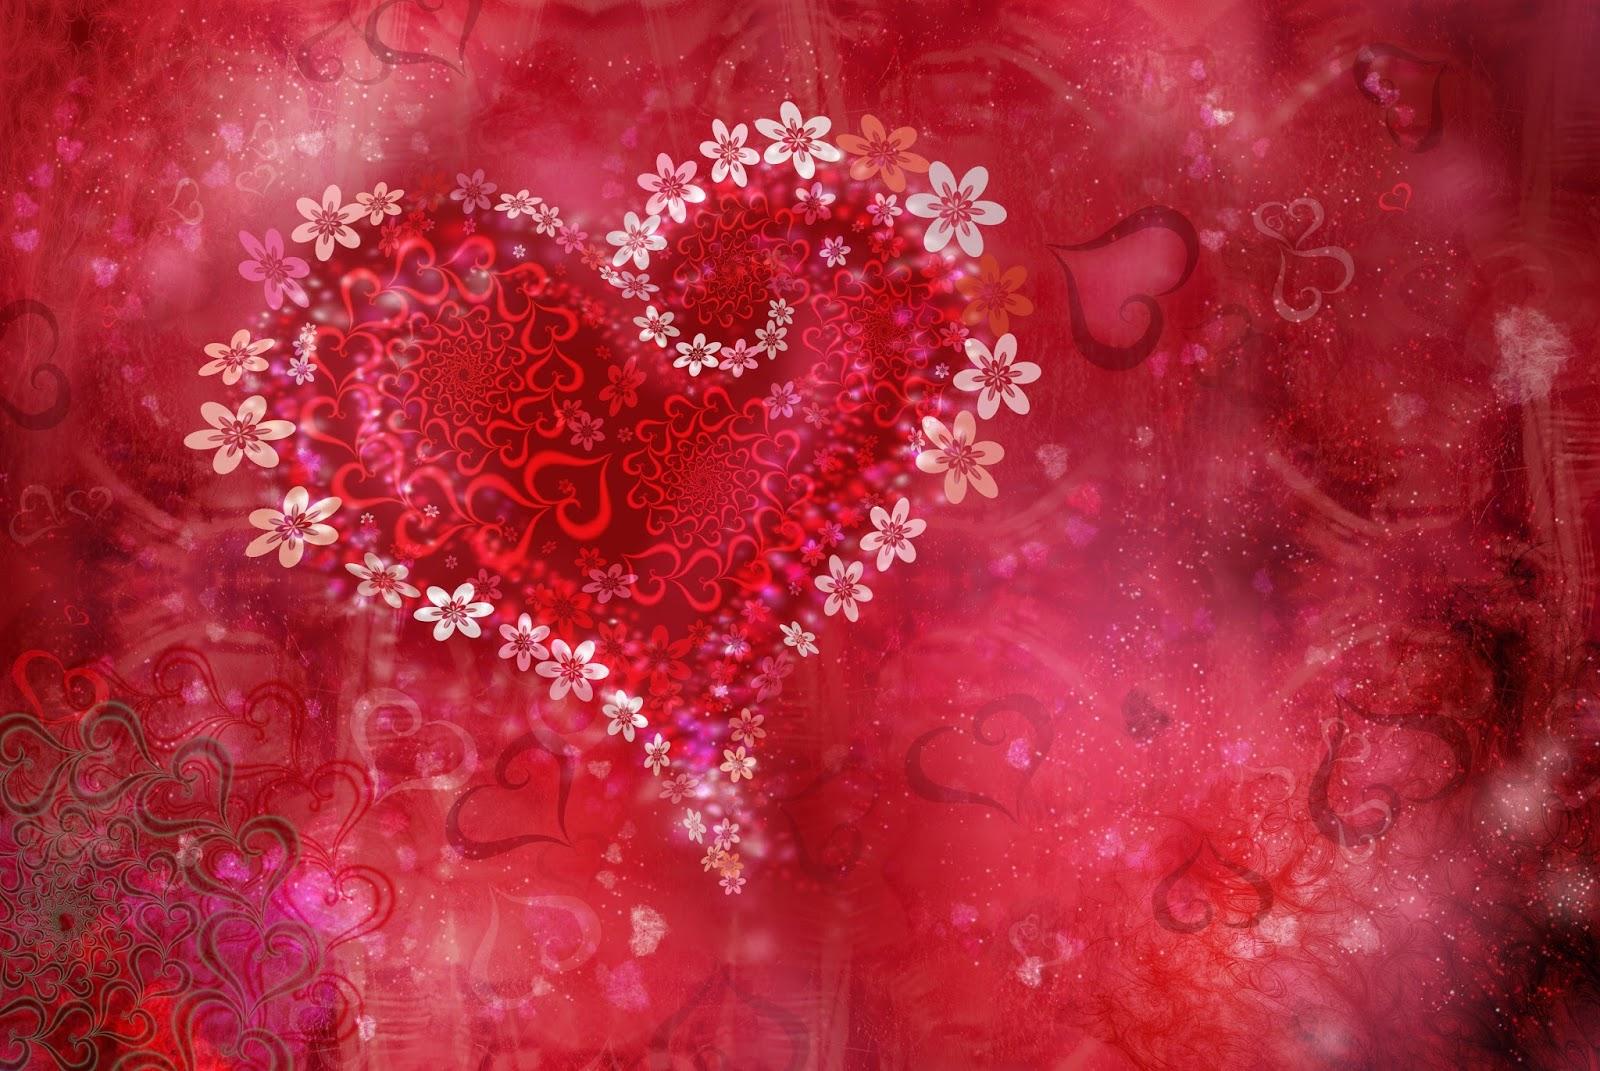 Fondos De Pantalla San Valentin Gratis: Fondos HD Wallpapers: Fondo De Pantalla Dia De San Valentin